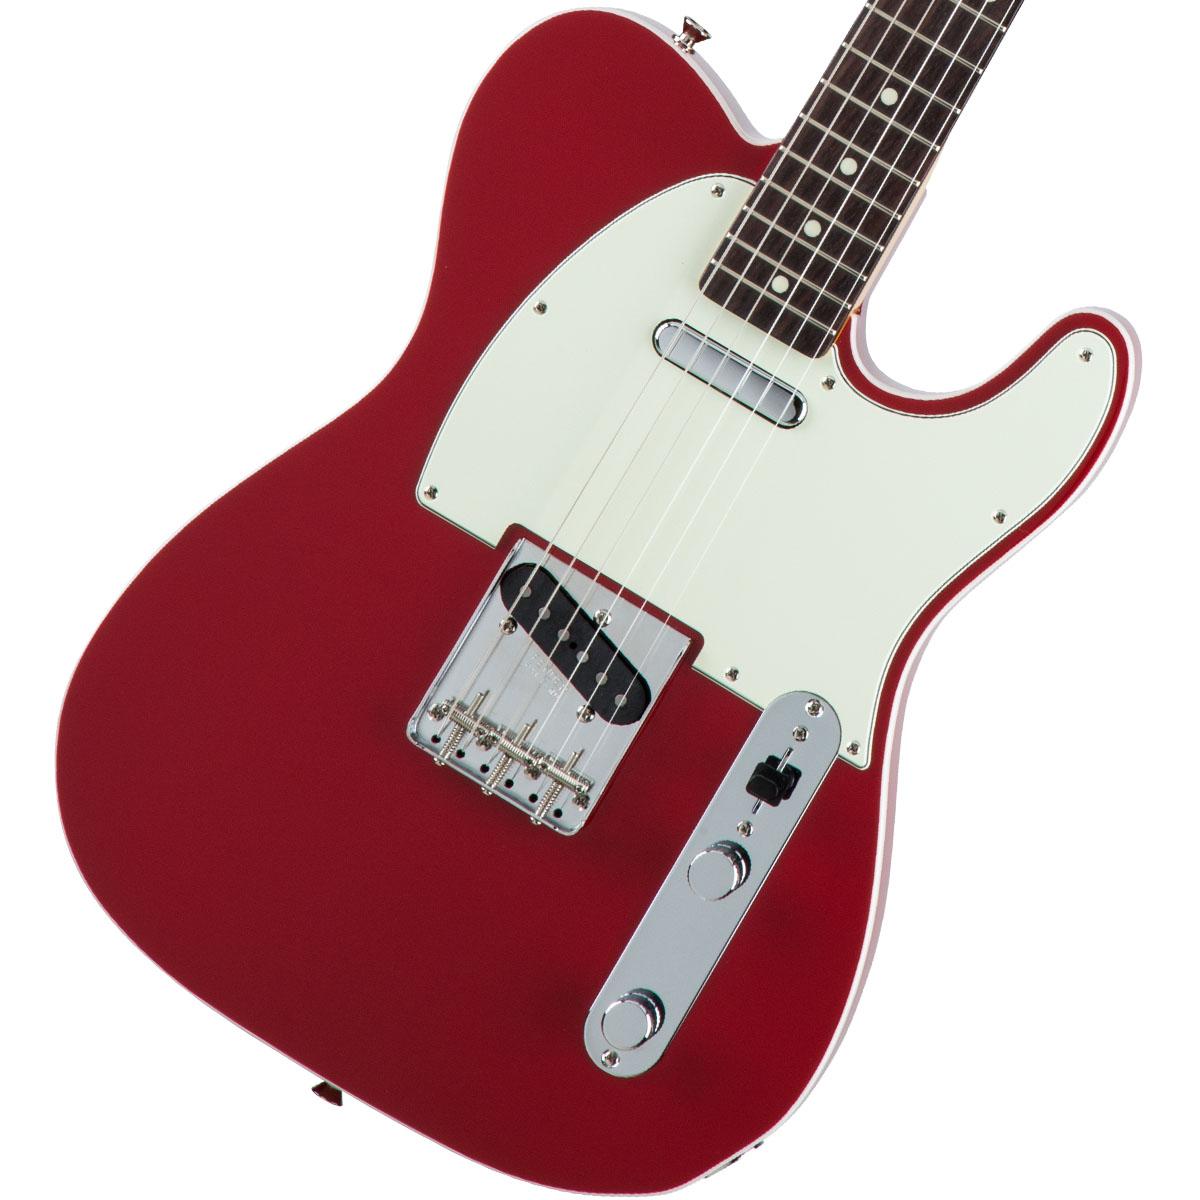 Fender / Made in Japan Traditional 60s Telecaster Custom Rosewood Fingerboard Torino Red 《カスタムショップのお手入れ用品を進呈/+671038200》